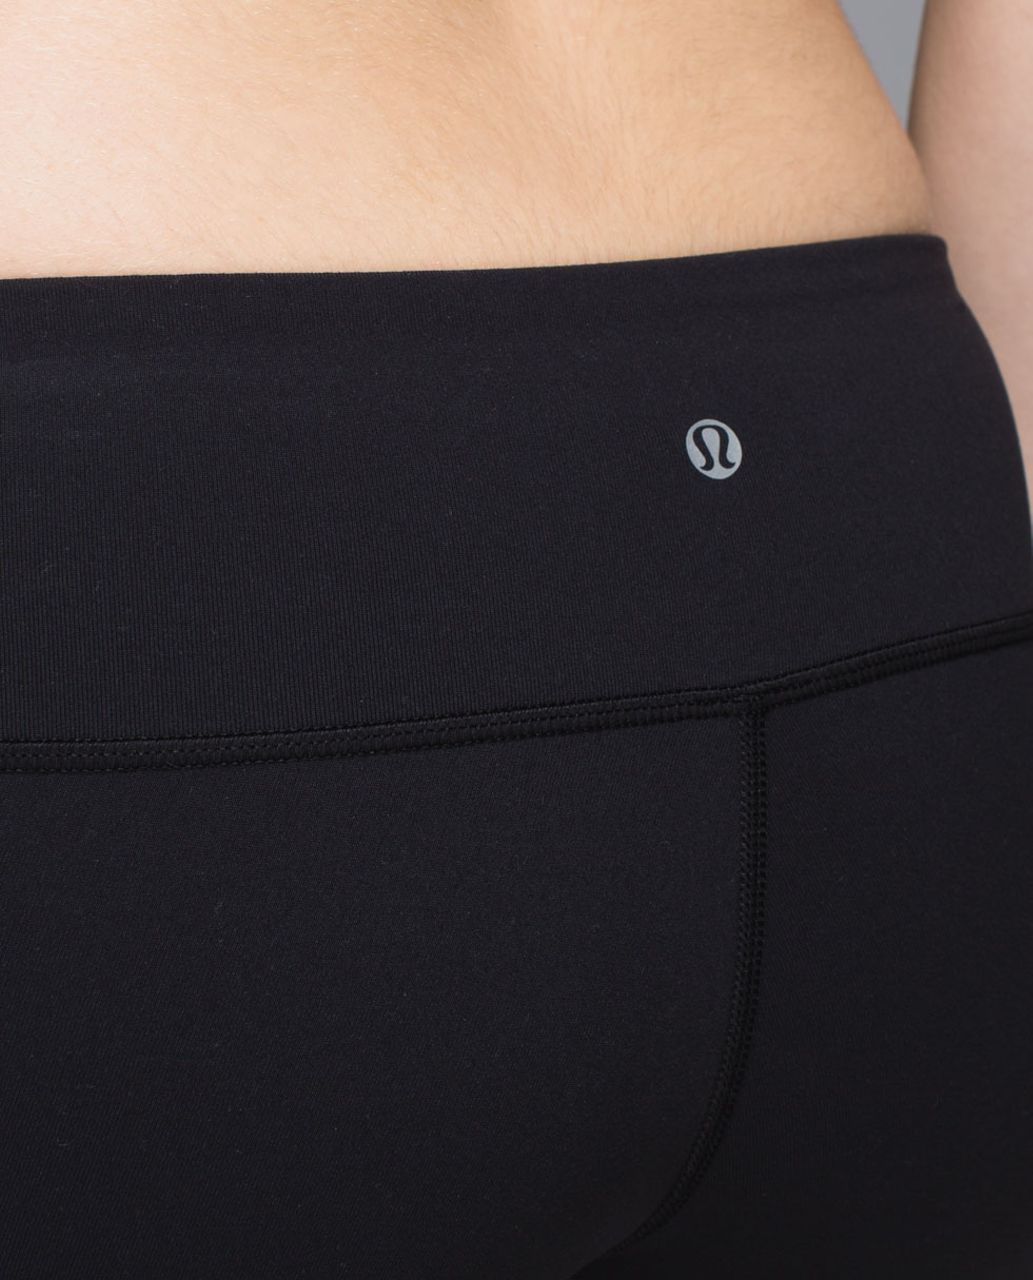 Lululemon Wunder Under Pant *Cire Wrap - Black (First Release)